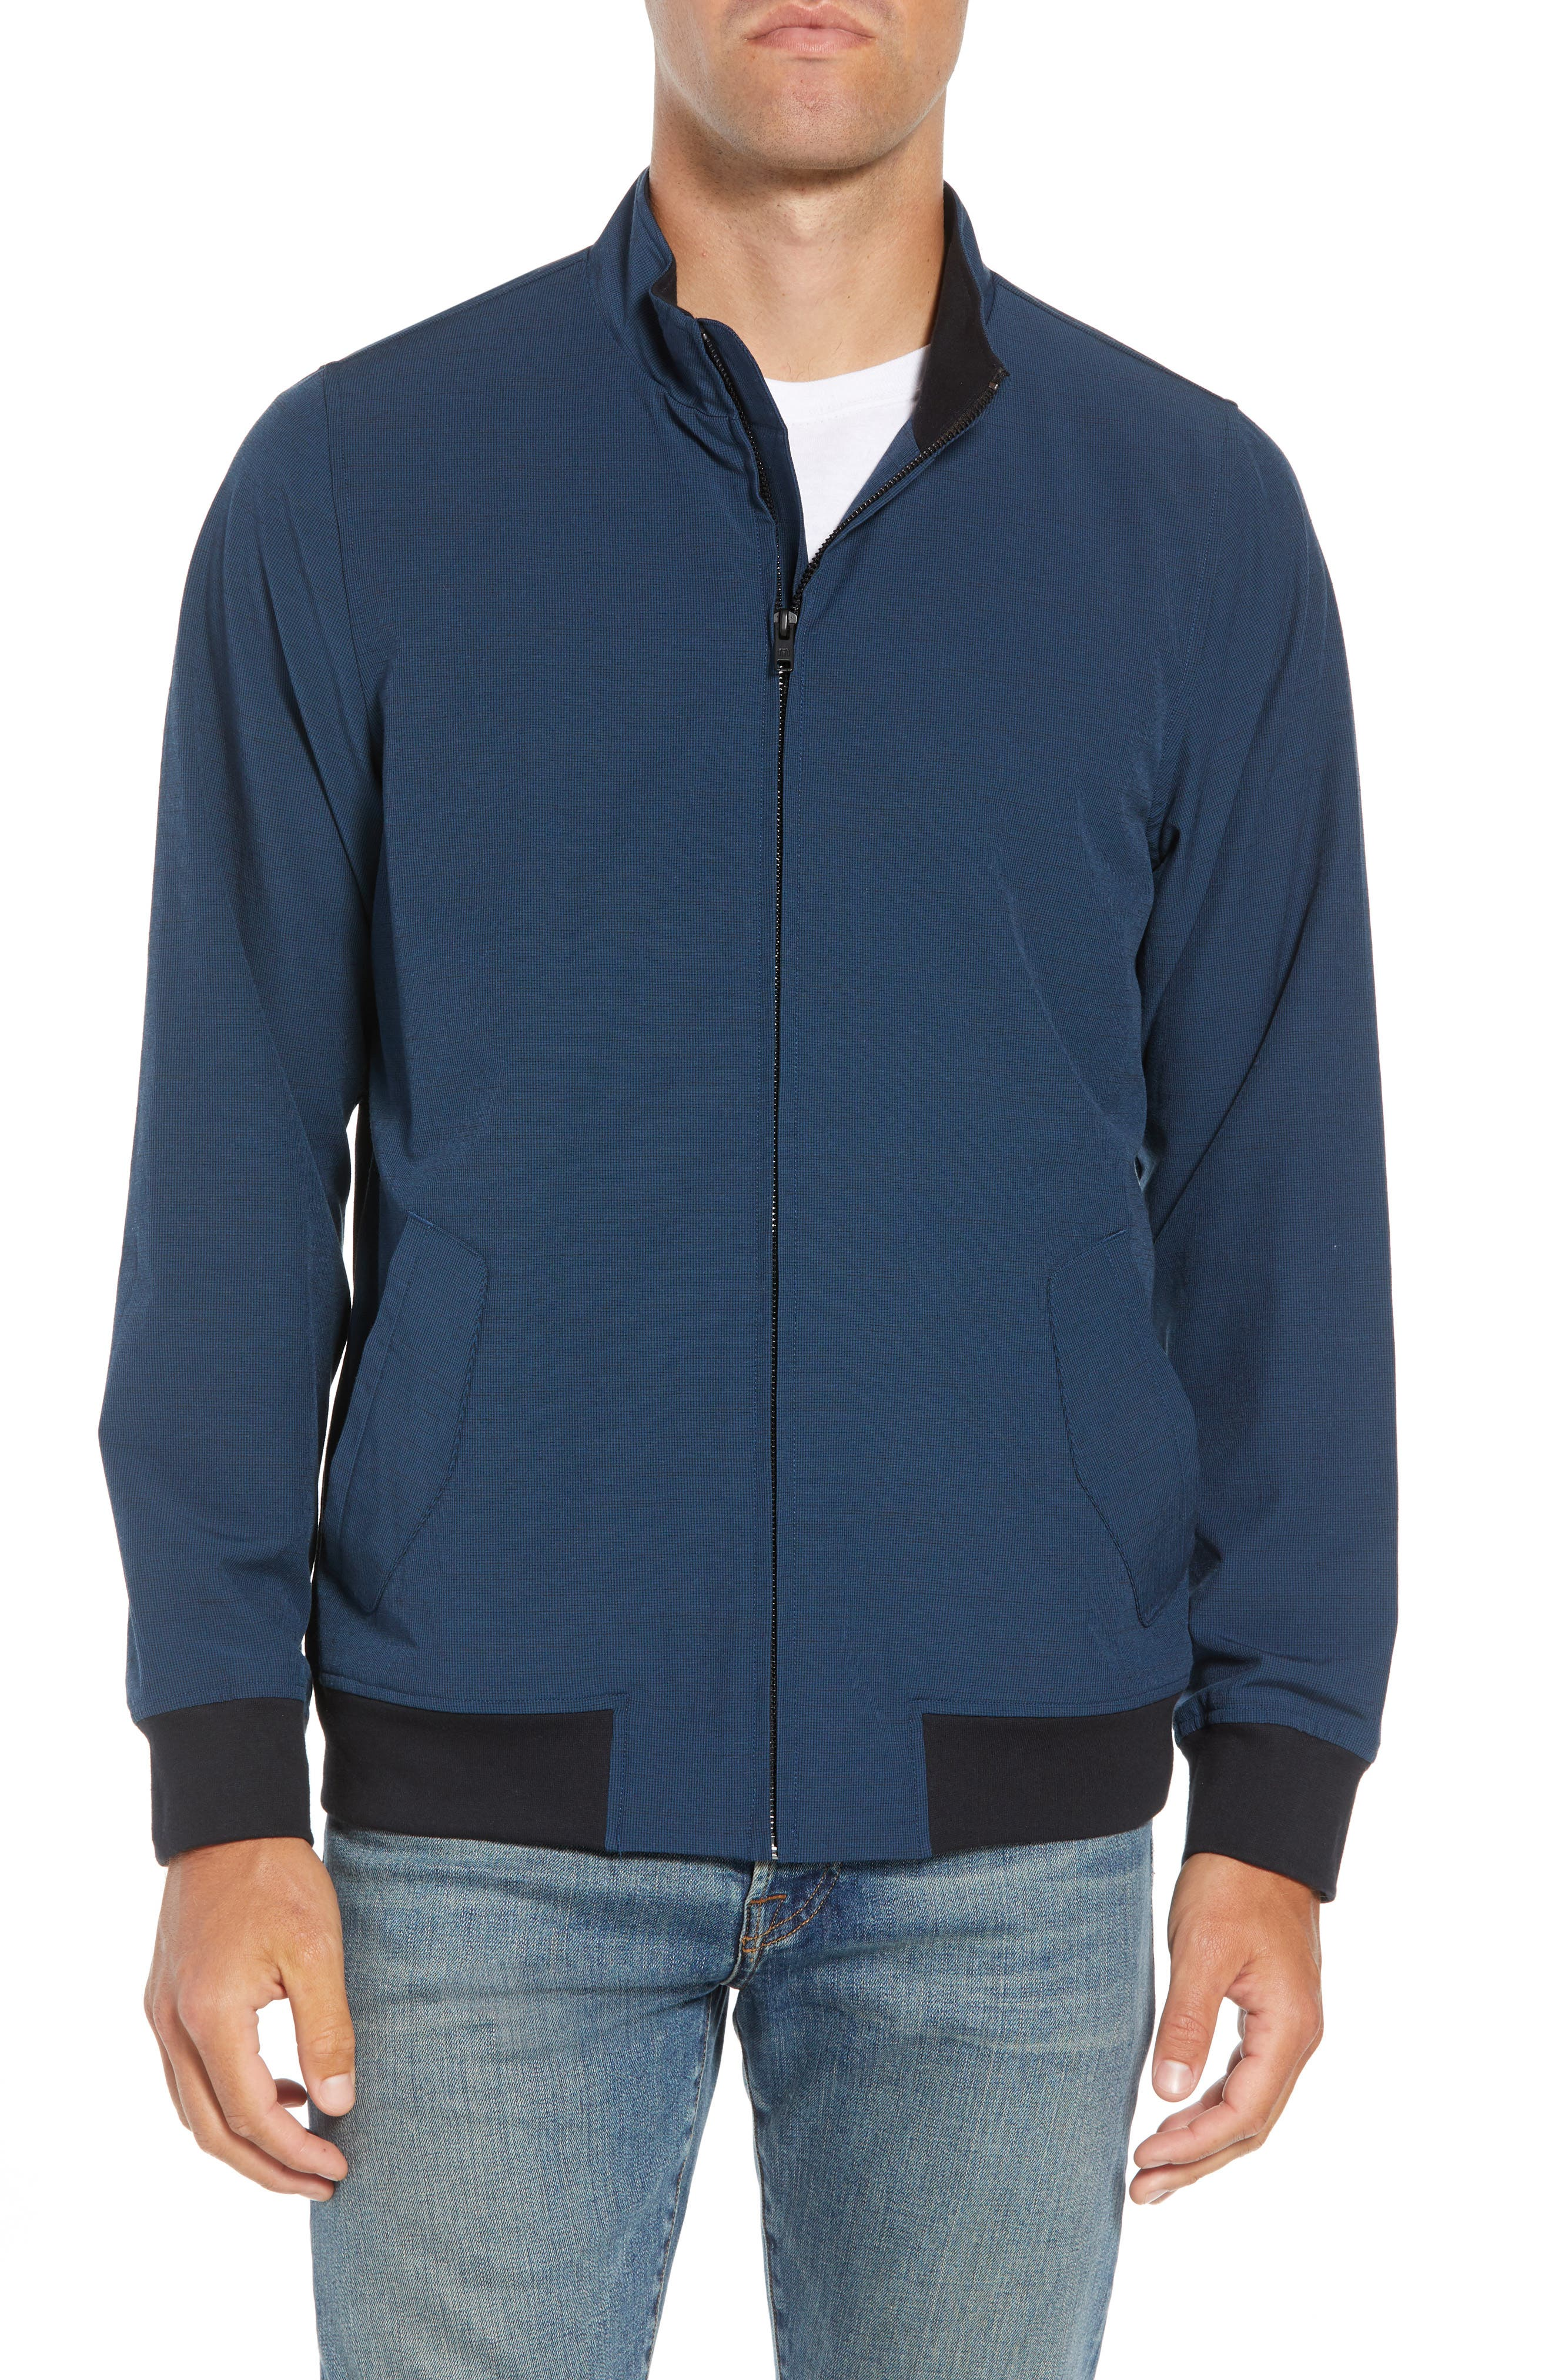 Ridgley Regular Fit Jacket,                             Alternate thumbnail 4, color,                             BLUE WING TEAL/ BLACK